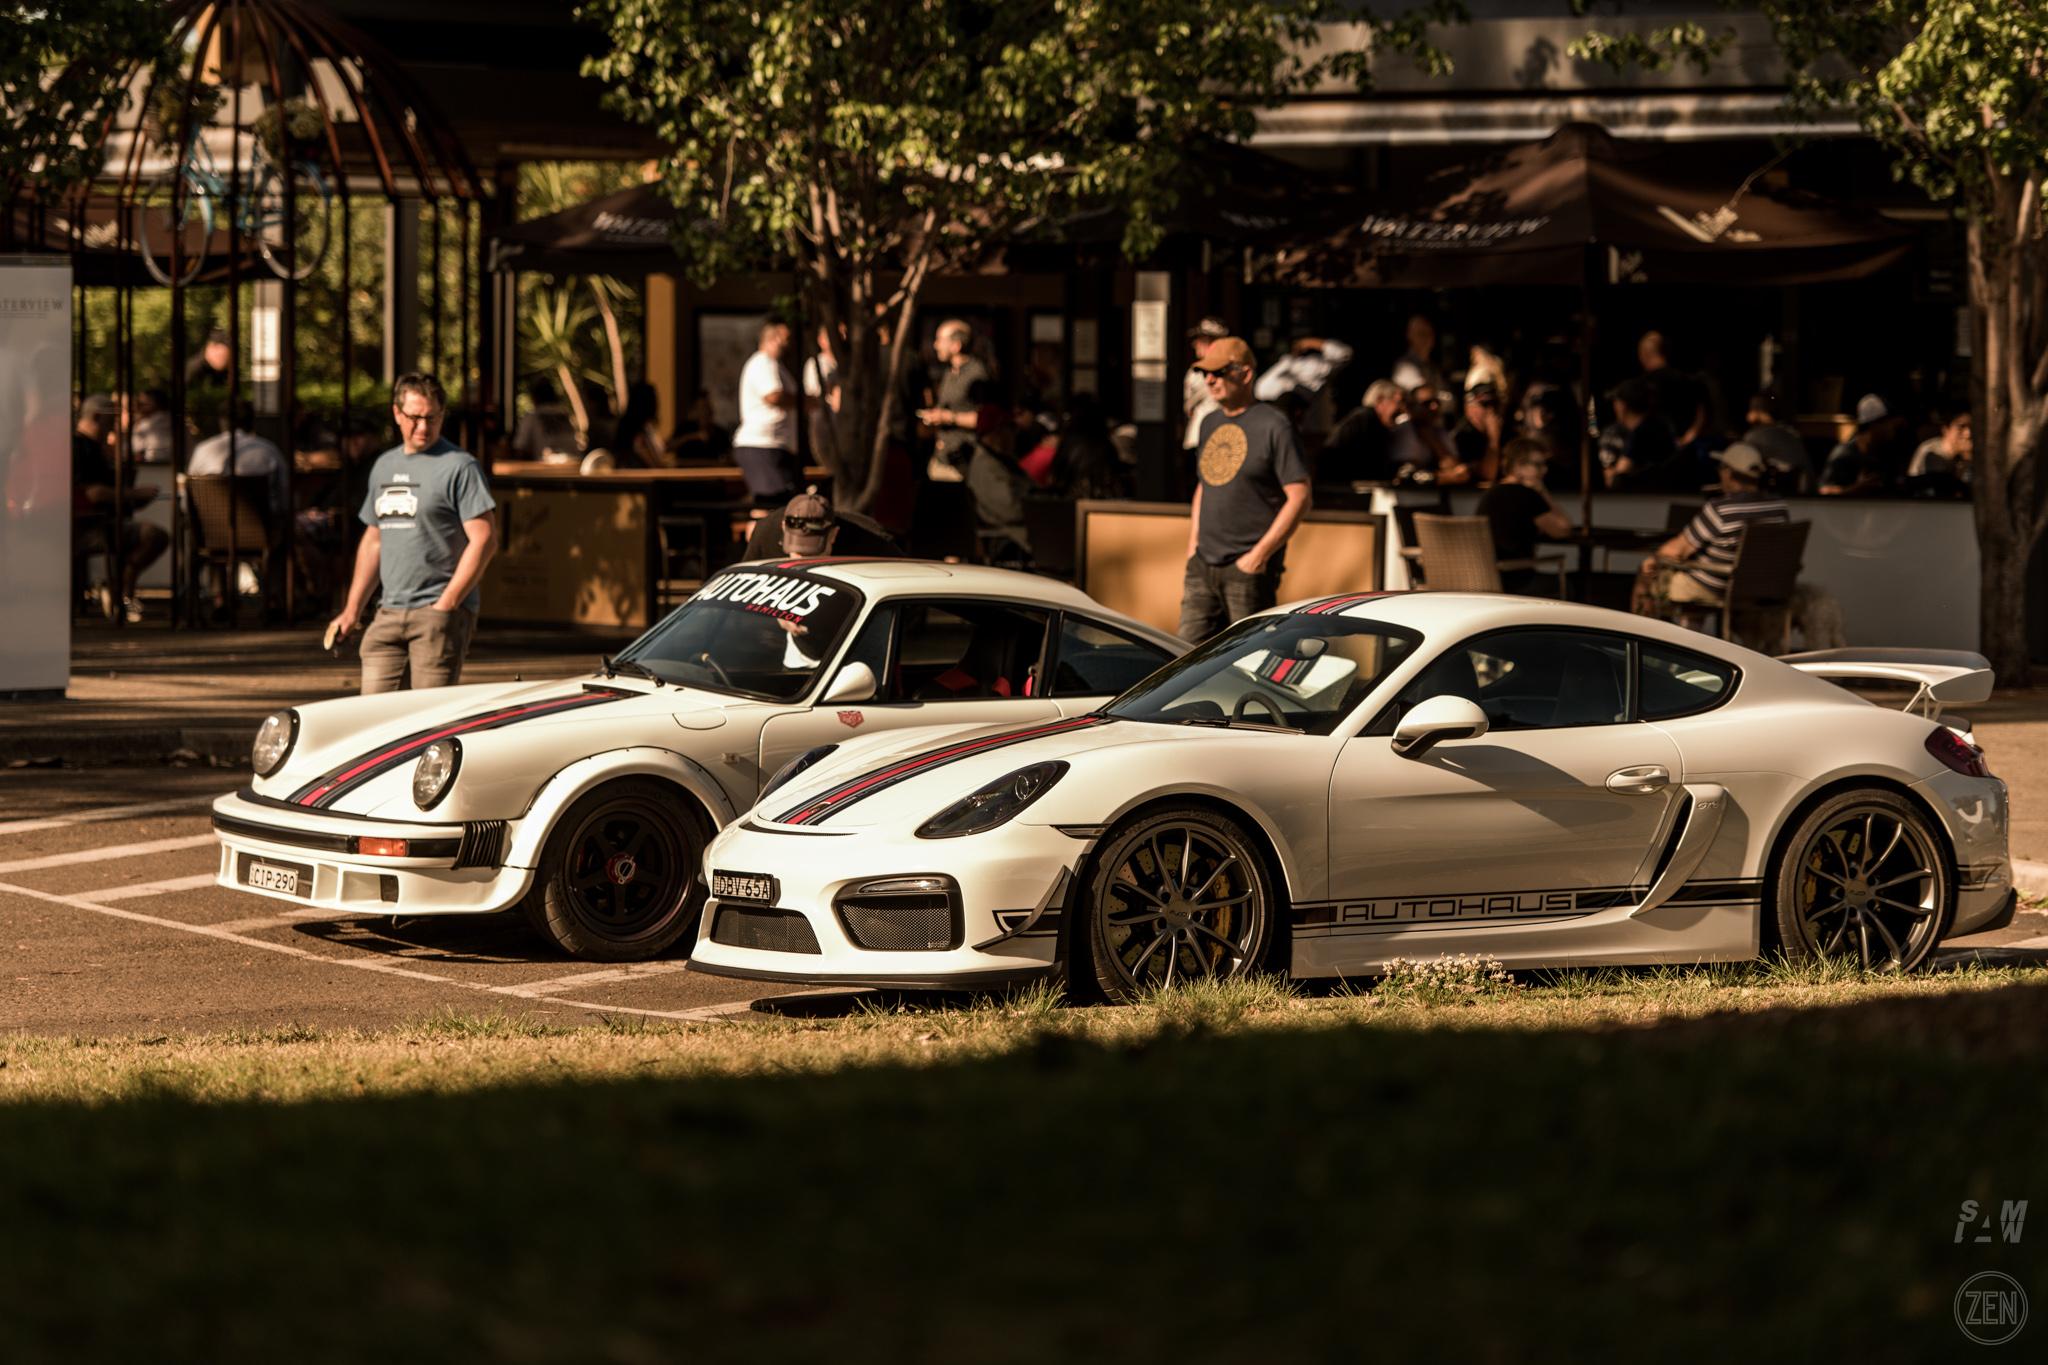 2019-10-27 - Autohaus Porsches & Coffee 138